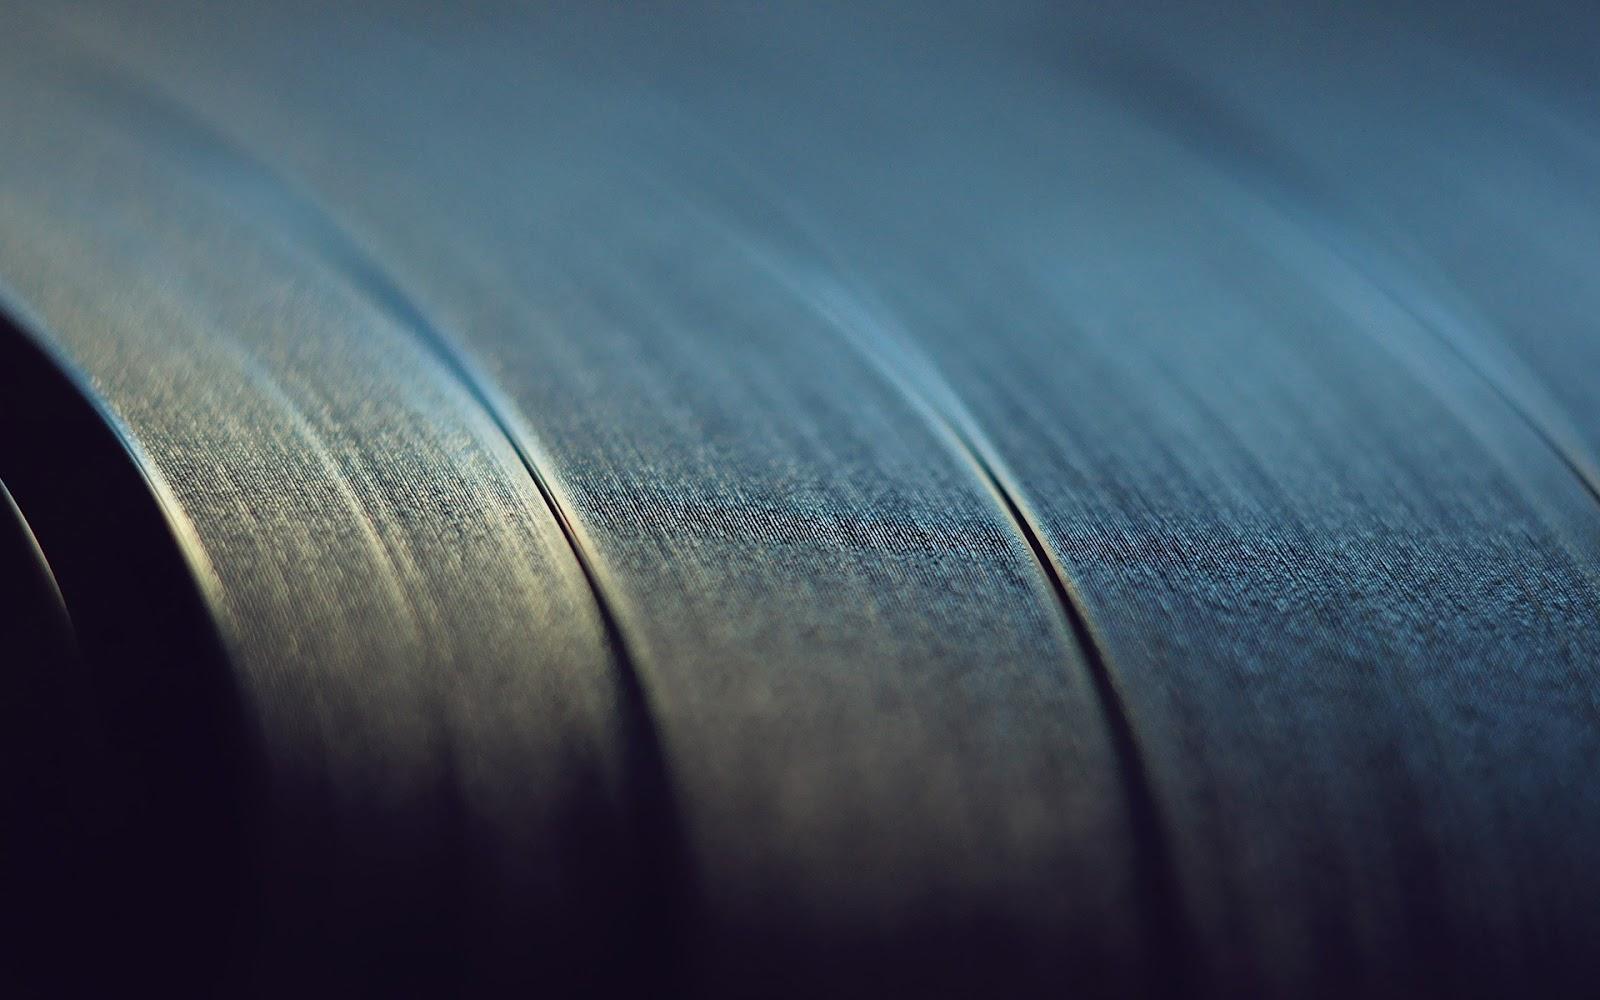 Vinyl wallpaper XBR58TU3AT6K 1600x1000